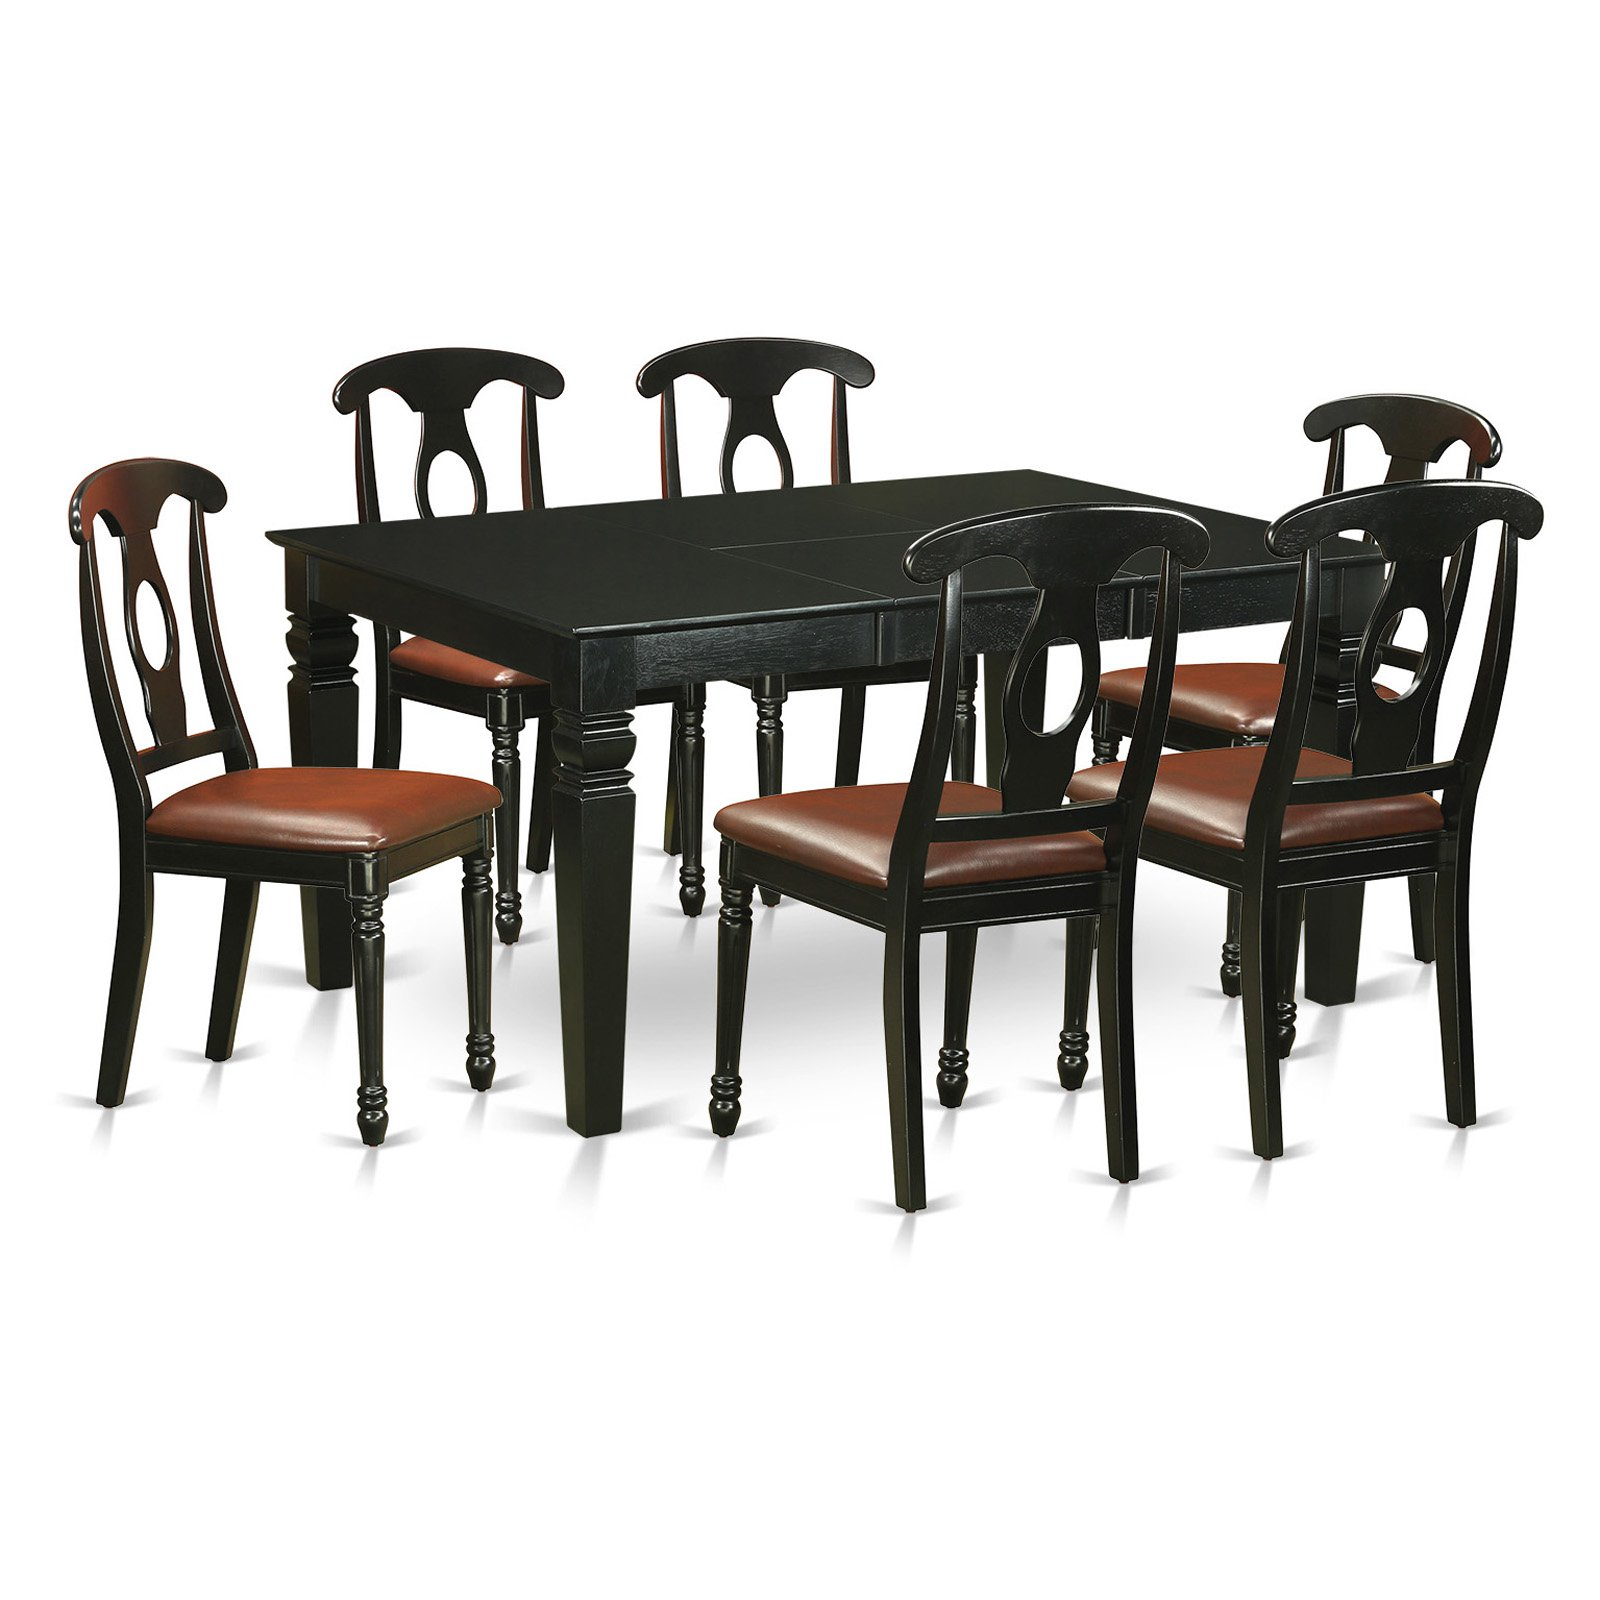 East West Furniture Weston 7 Piece Keyhole Dining Table Set